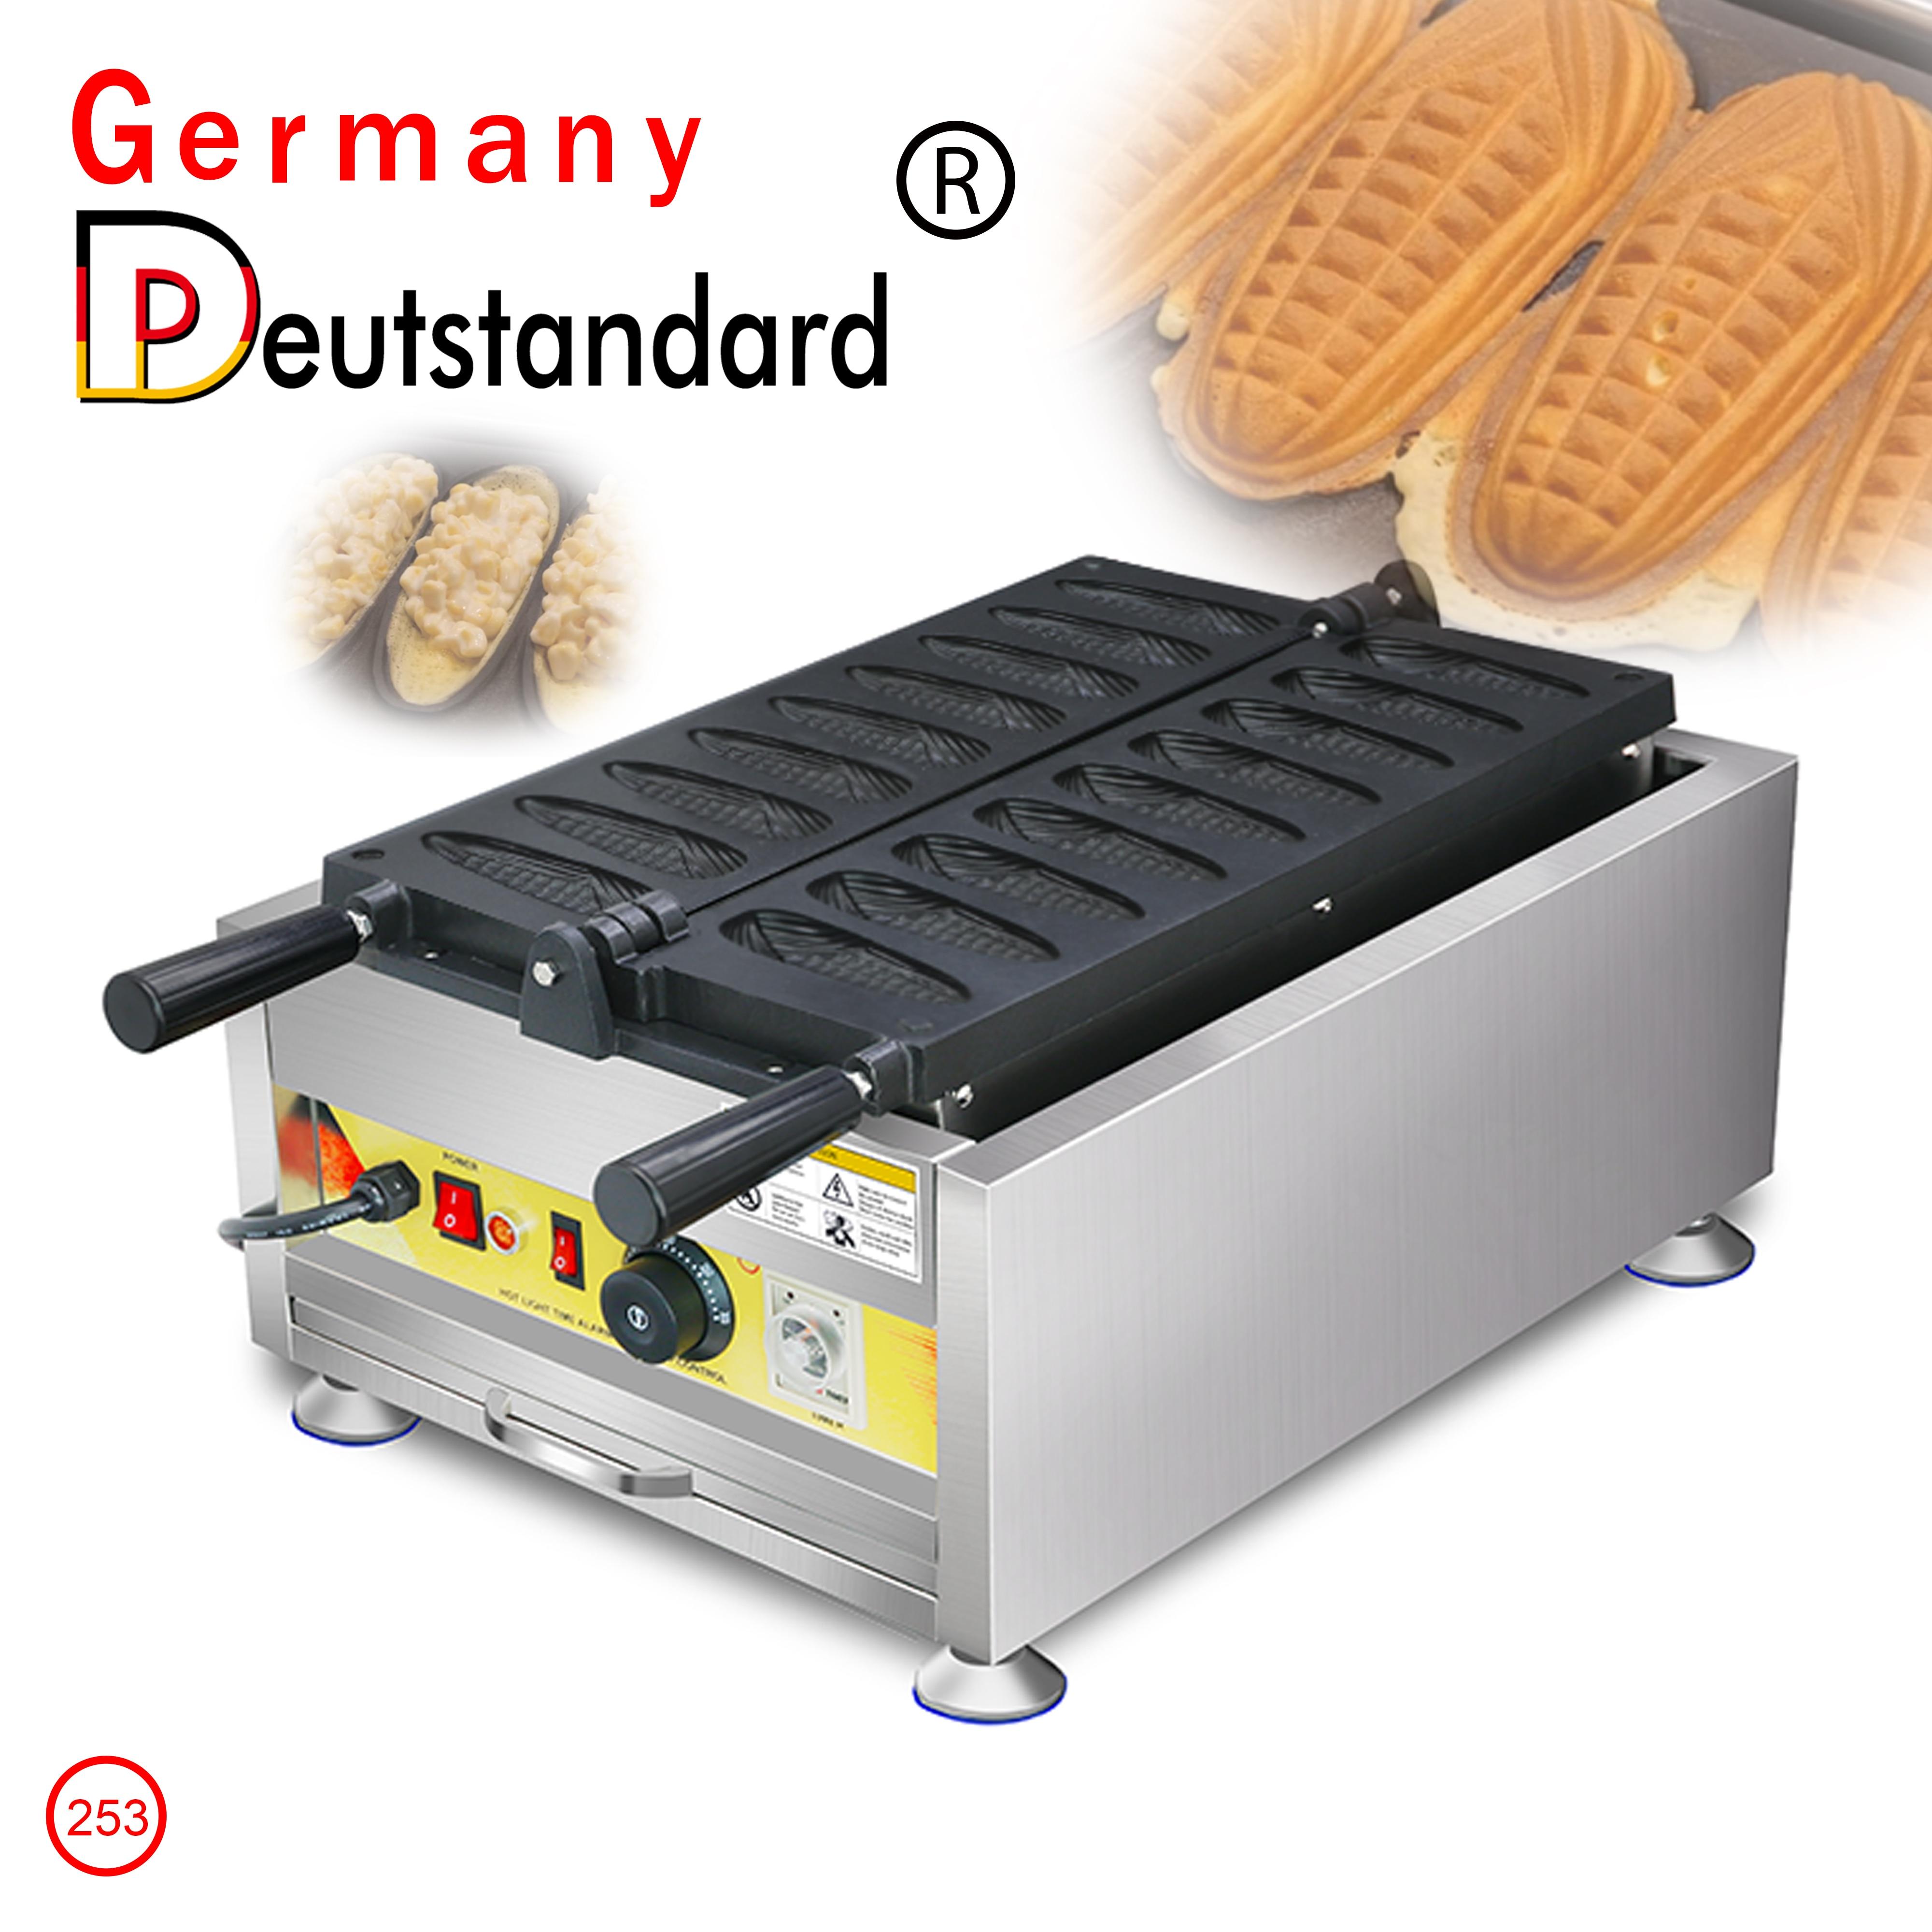 Commercial Electric Non stick Corn Shape Waffle Maker Hot Dog Machine Lolly Waffle Maker Muffin Waffles Pan Baking Equipment недорого